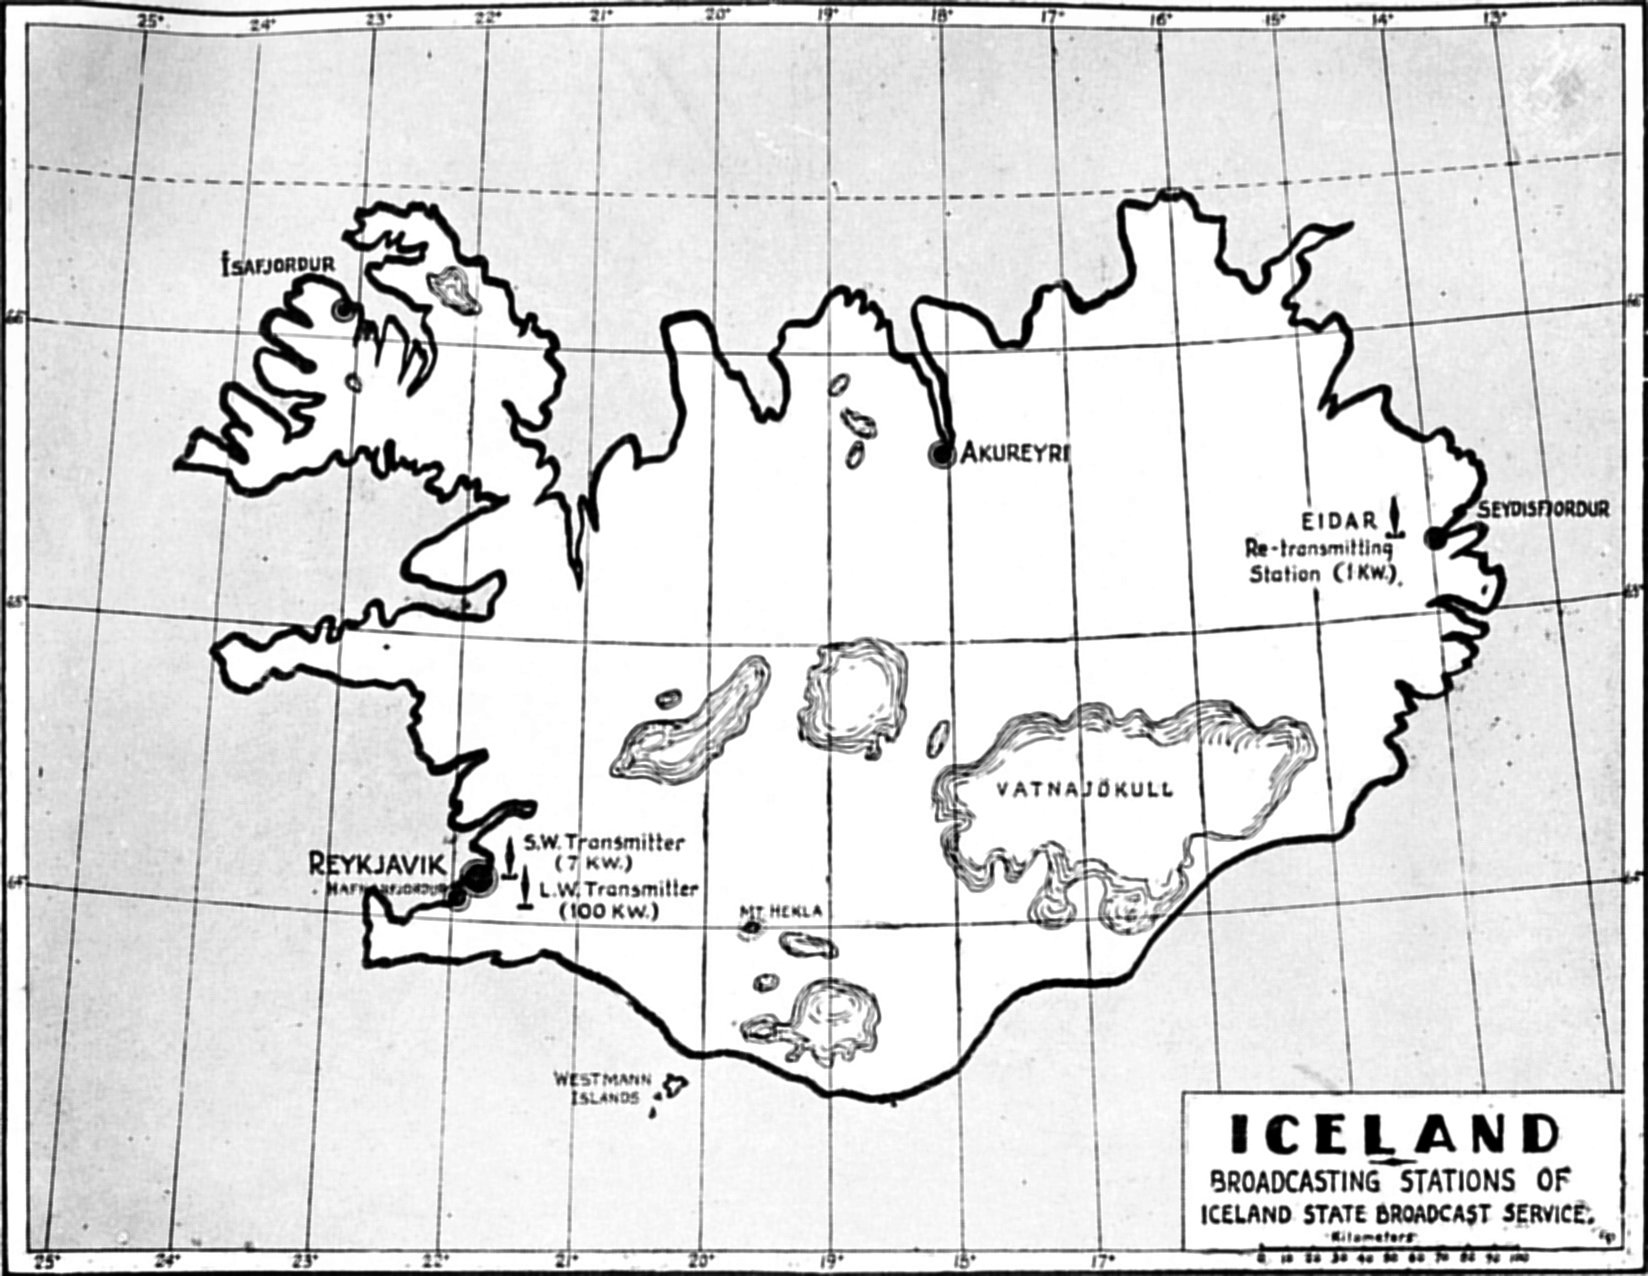 Iceland State Broadcast Service 25 Metres Range Short Wave Am Transmitter